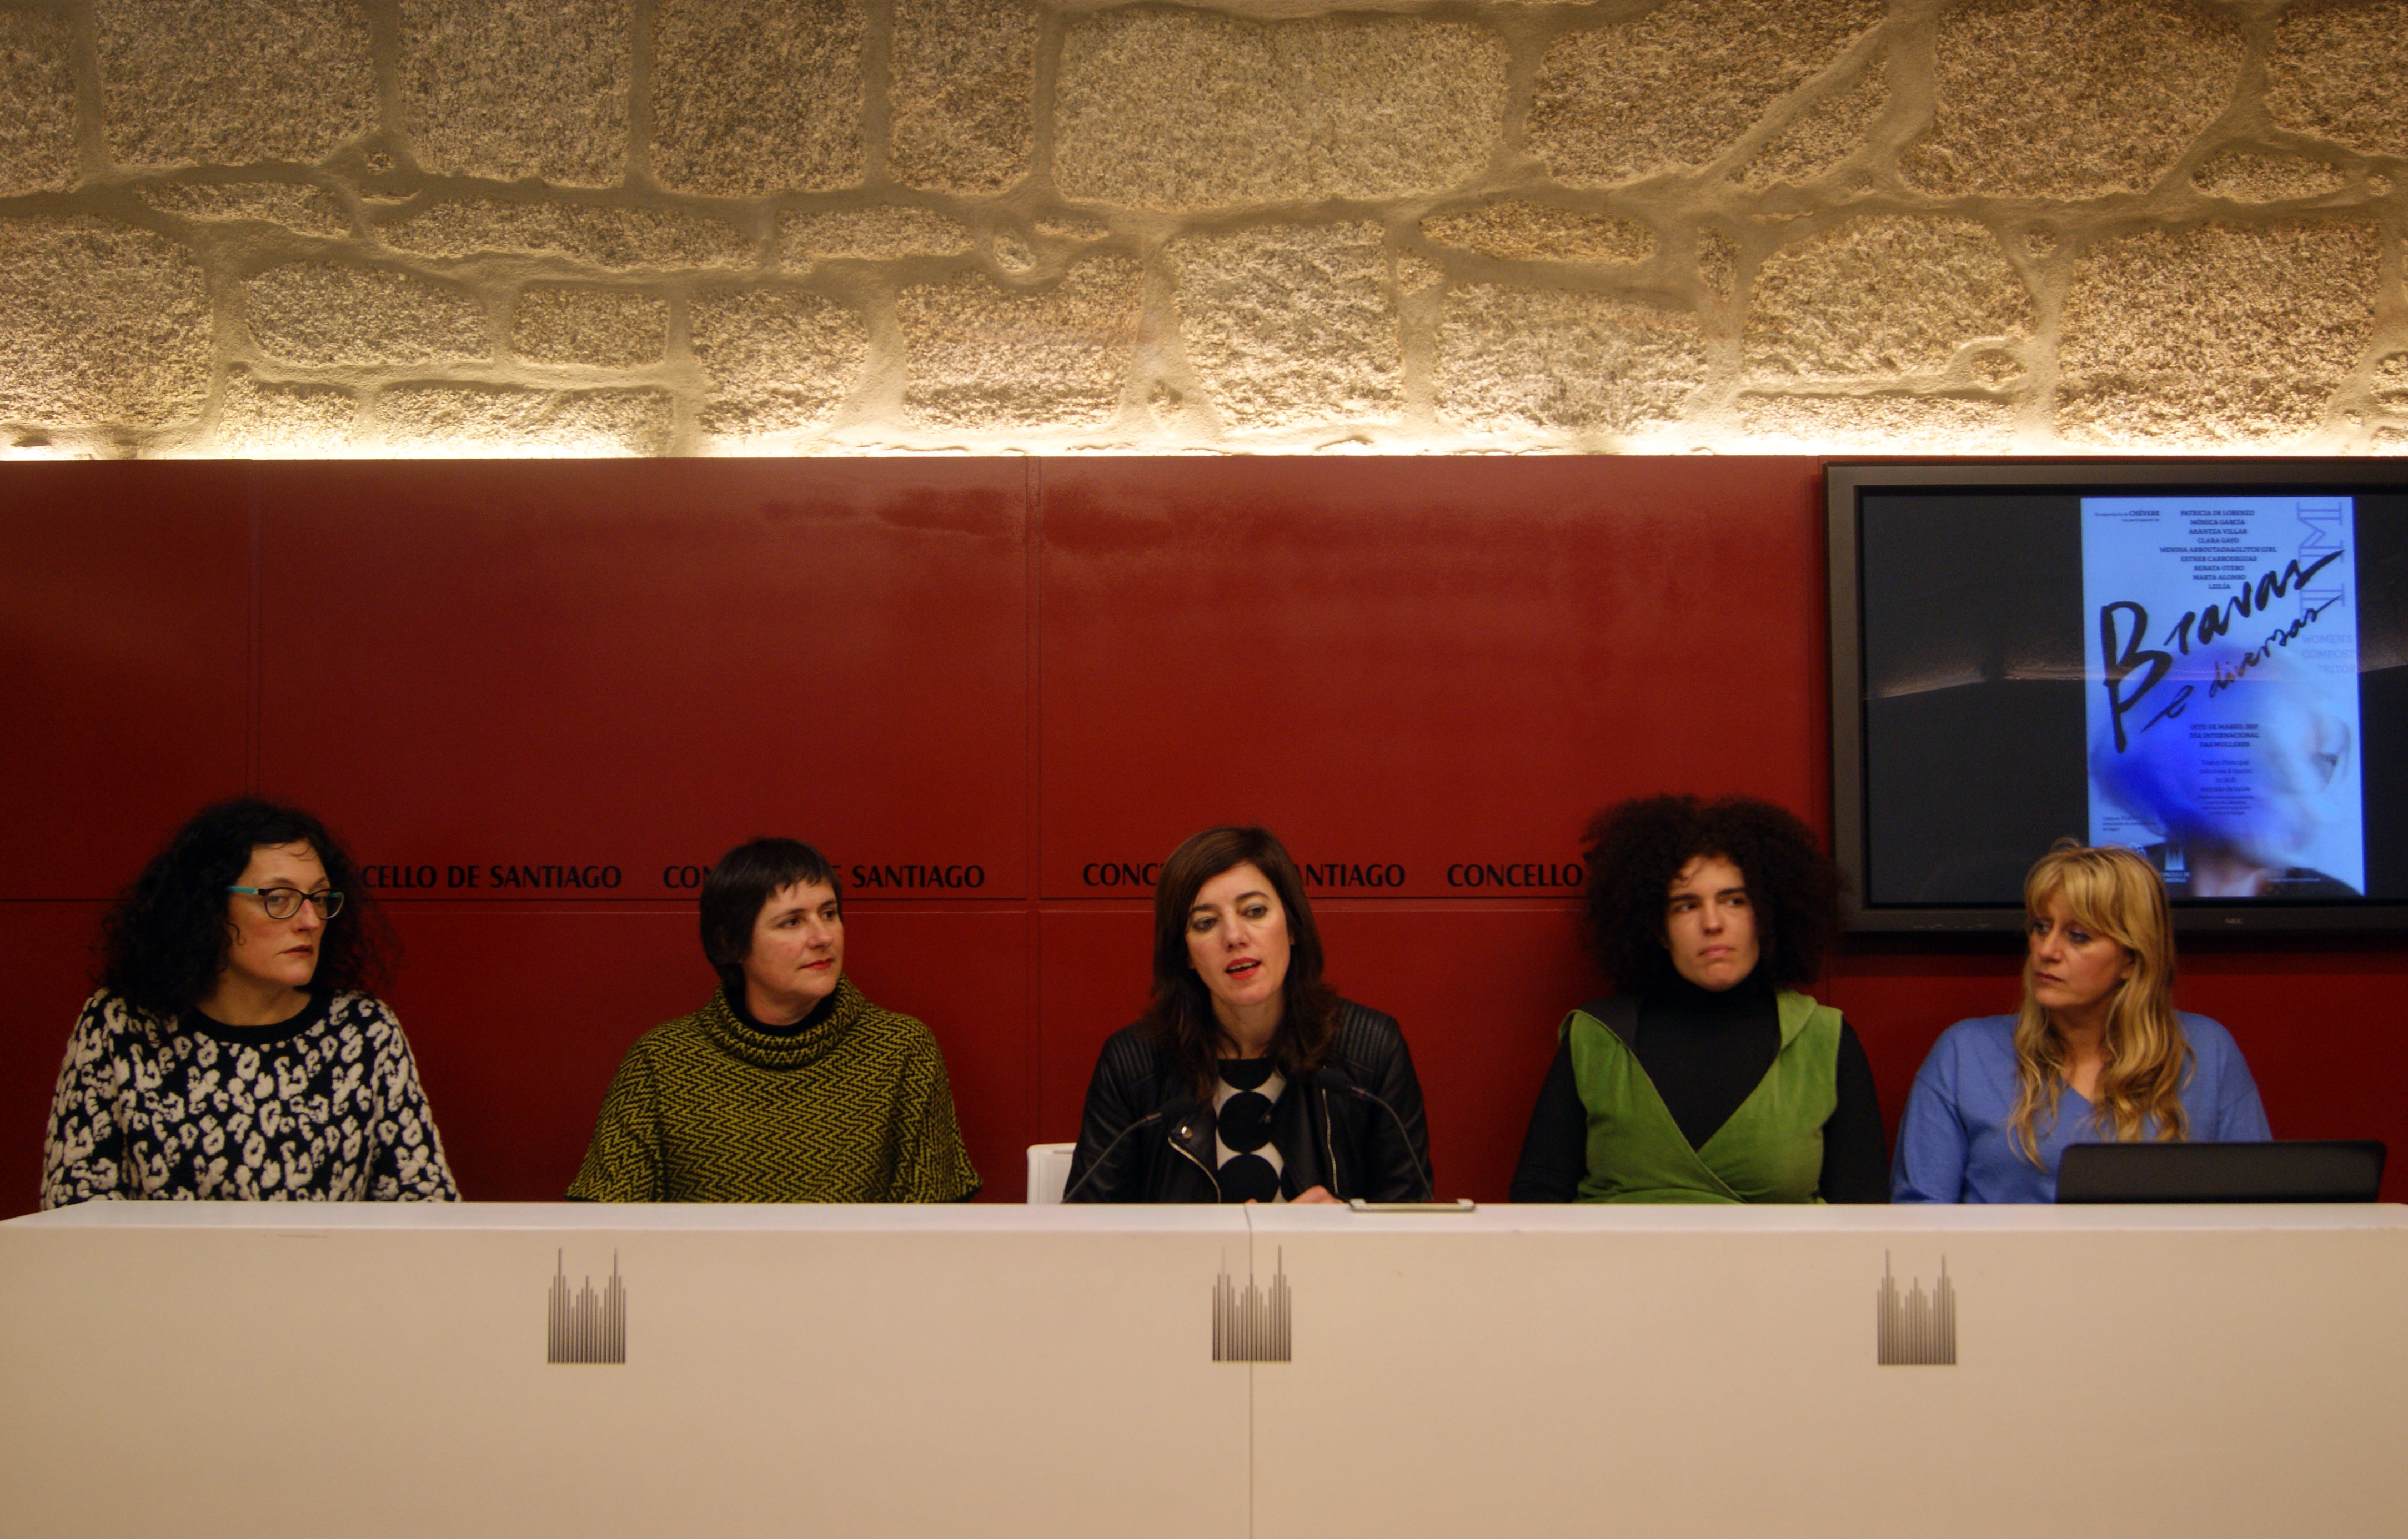 Clara Gayo, Patricia de Lorenzo,  Marta Lois, Esther Carrodeguas e Renata Otero.